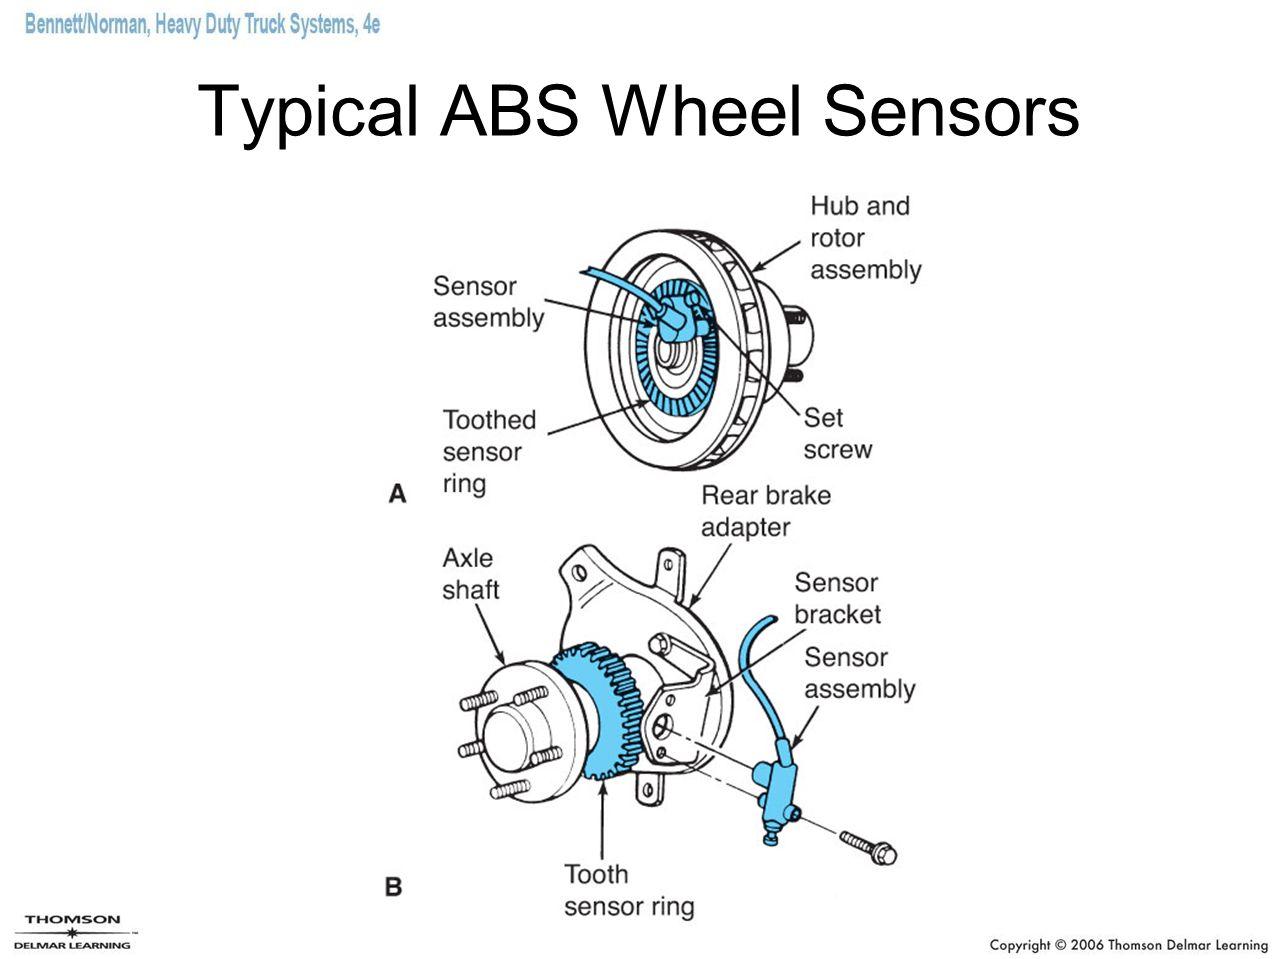 Typical ABS Wheel Sensors